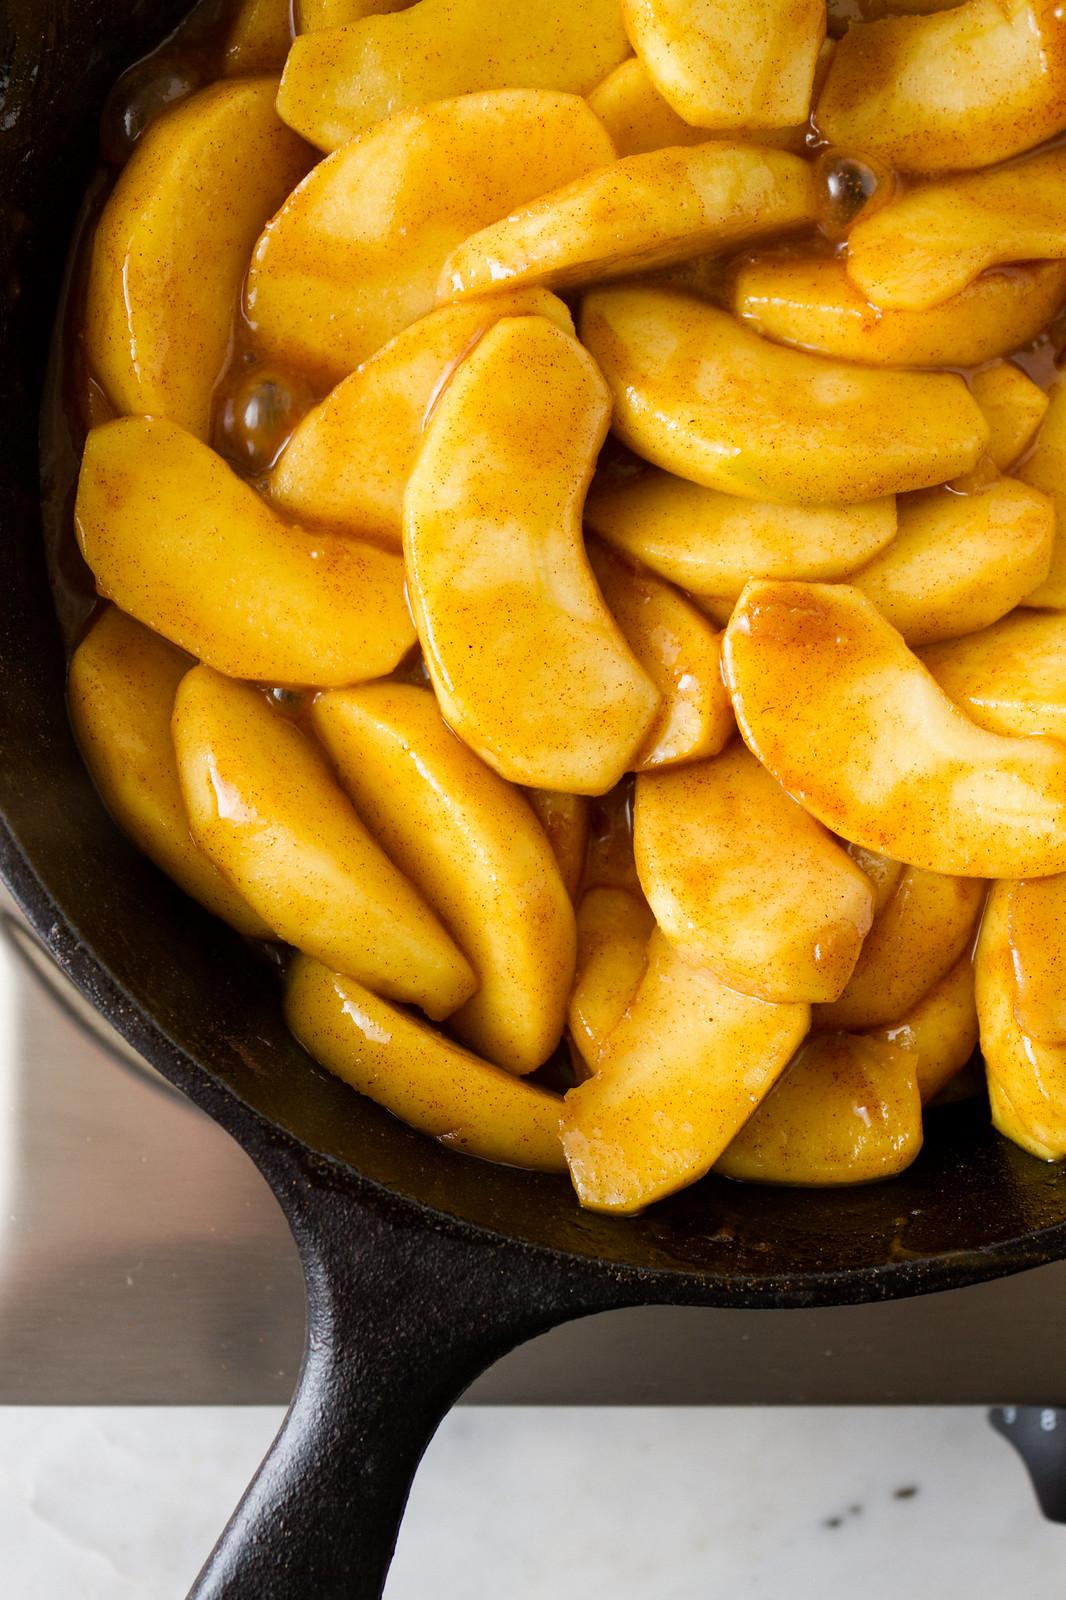 cinnamon apples freshly cooked